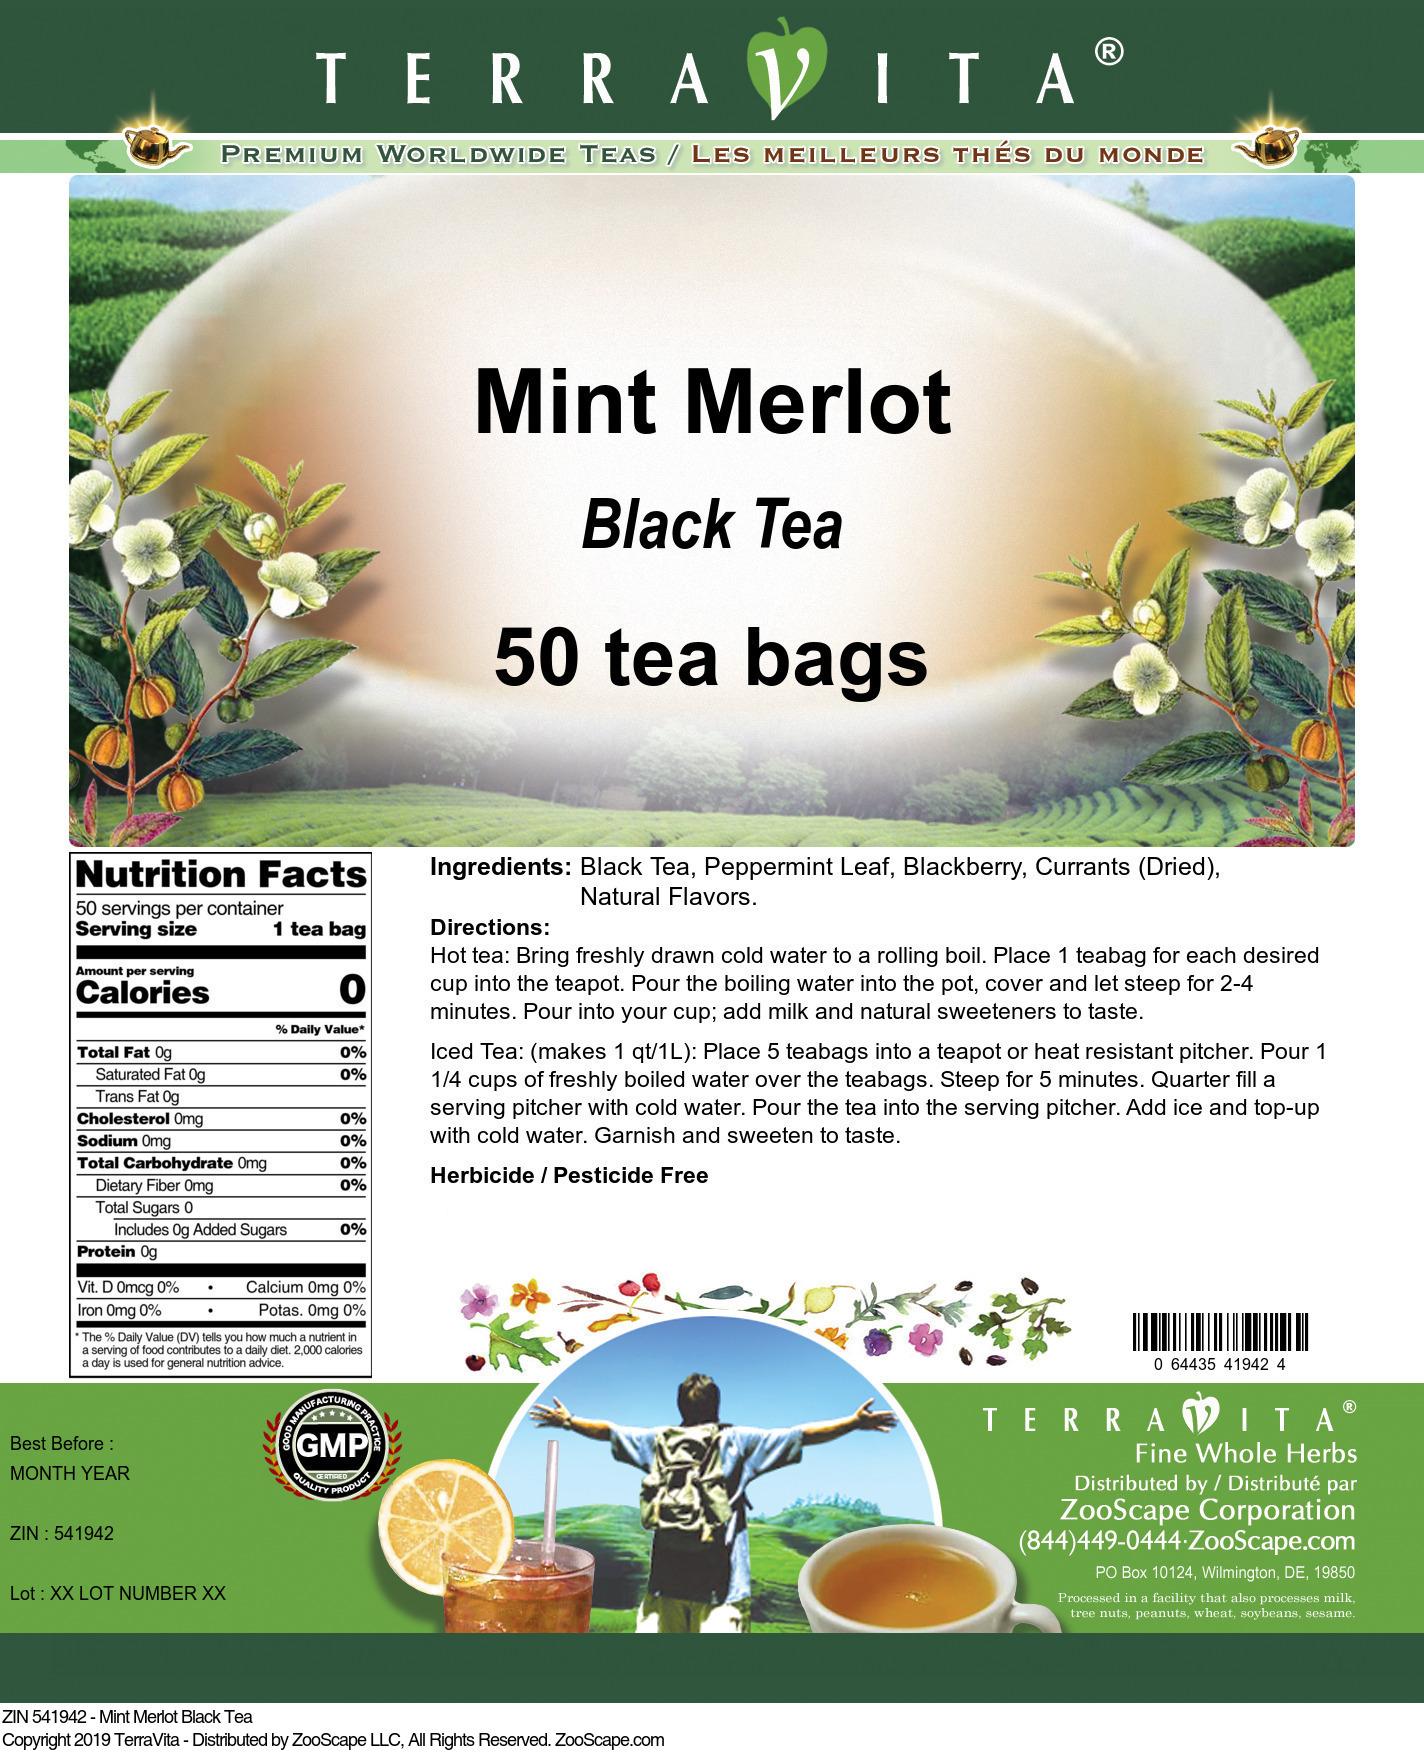 Mint Merlot Black Tea